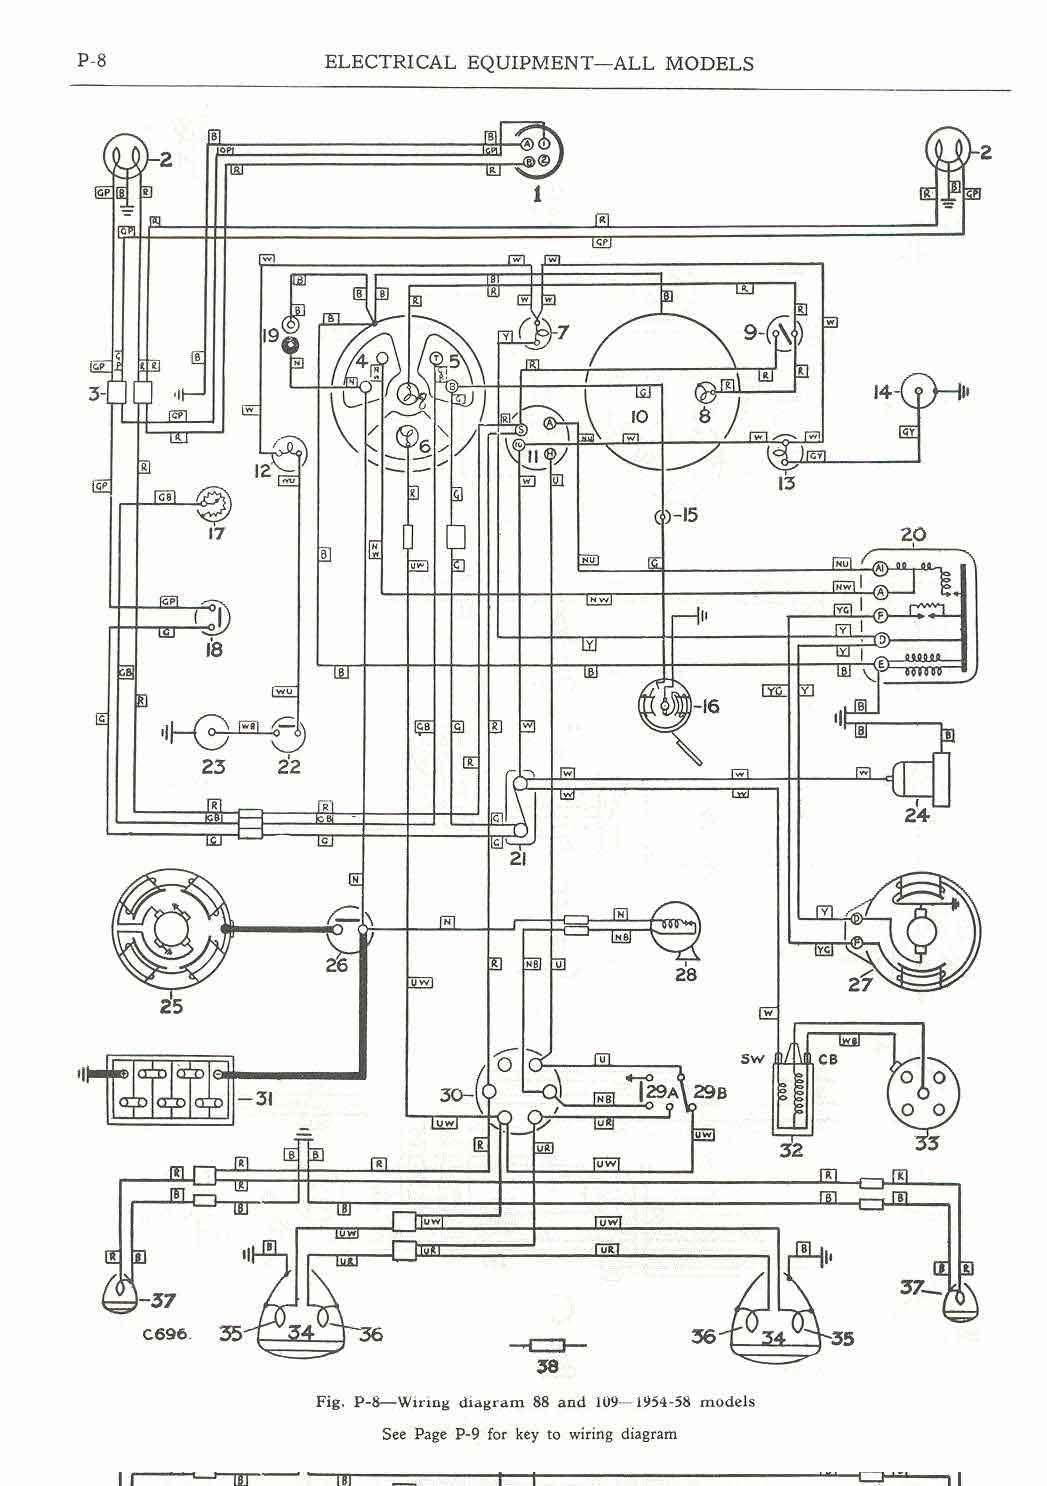 [DIAGRAM] Land Rover Velar Wiring Diagram FULL Version HD